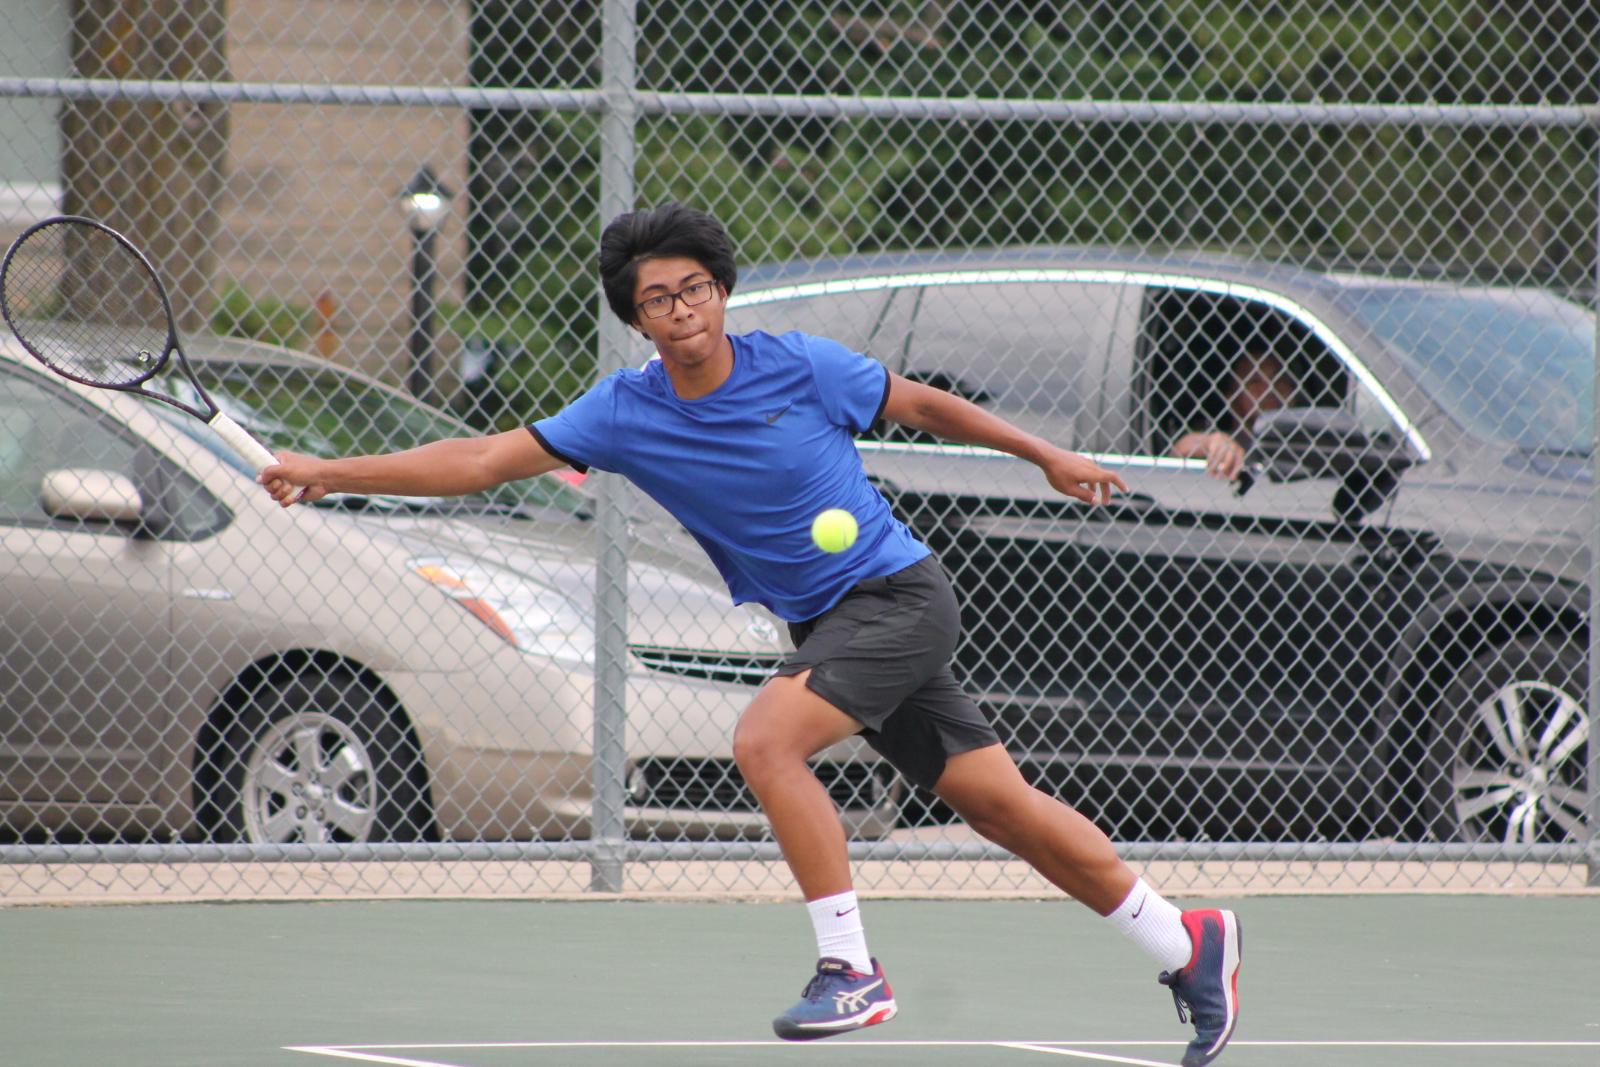 Boys Tennis vs SB St Joseph (August 25)